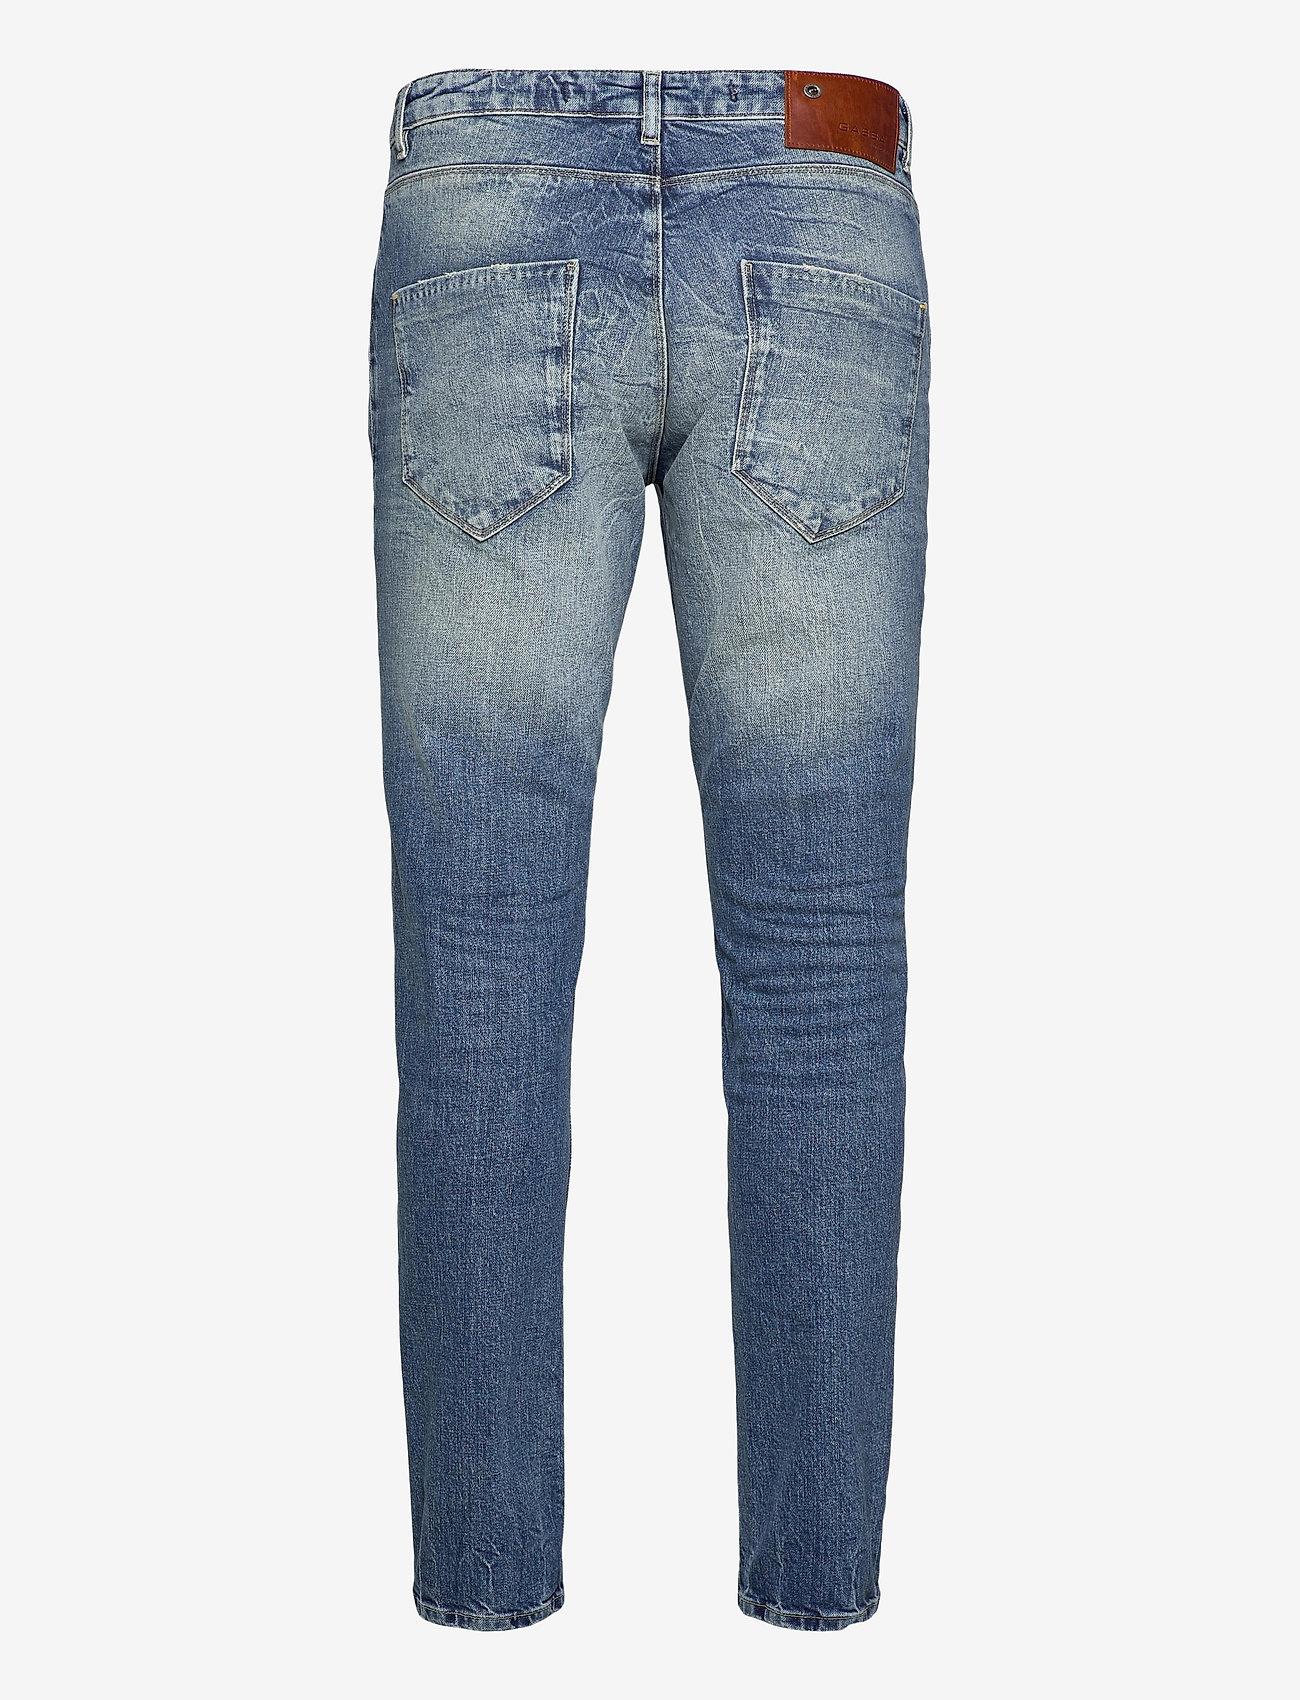 Gabba - Rey K3830 Jeans - slim jeans - rs1363 - 1